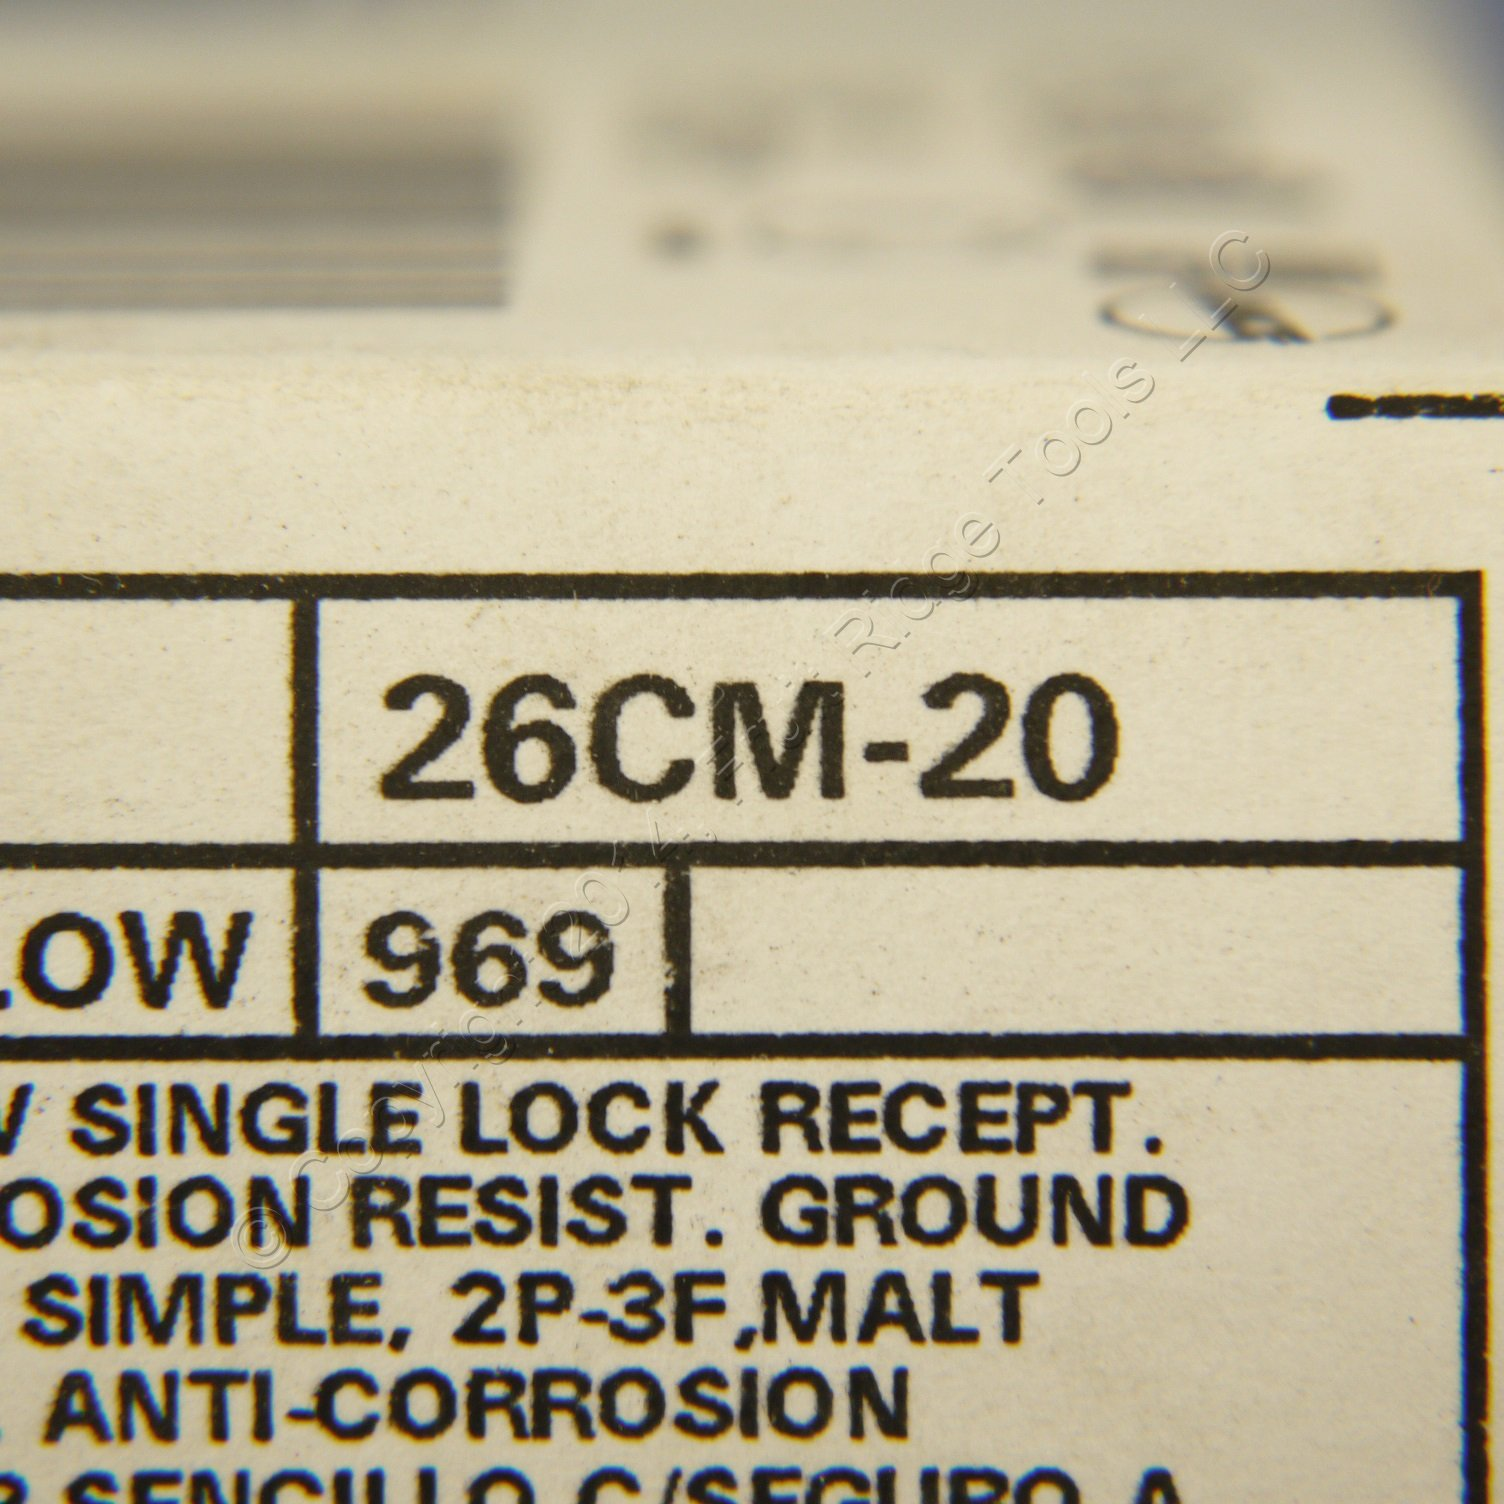 Leviton 26CM-20 30 Amp, 250 Volt, Flush Mounting Locking Receptacle, Industrial Grade, Grounding, Corrosion Resistant, Yellow